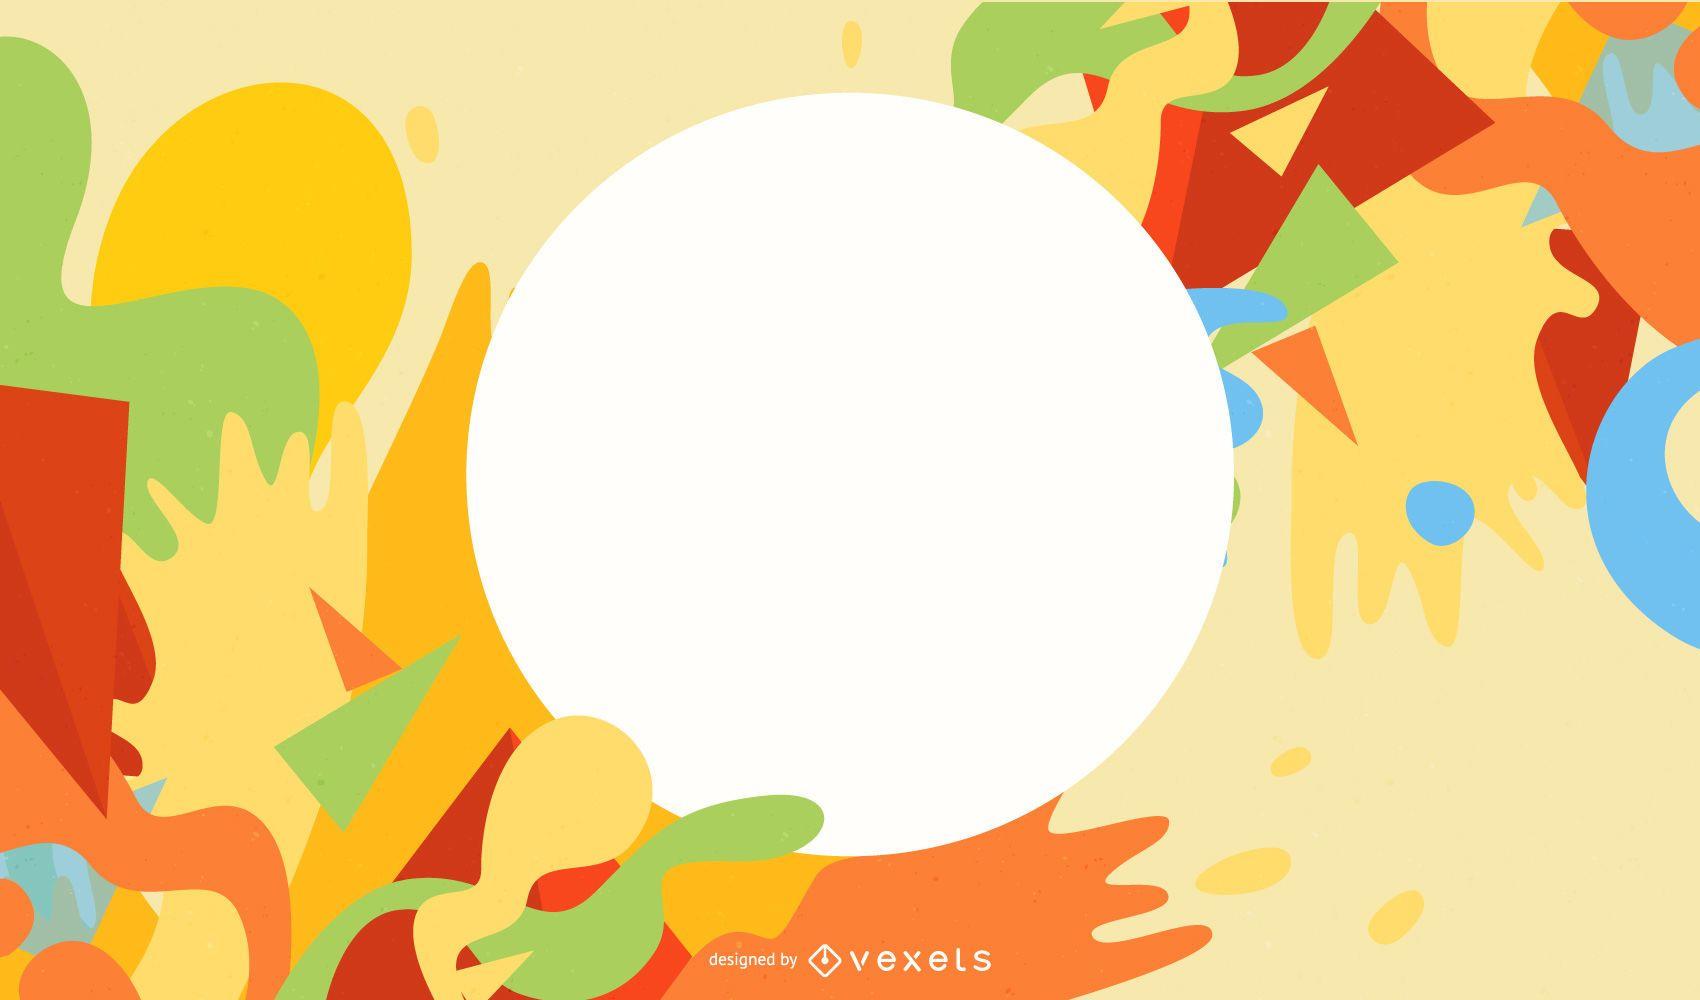 Circular Banner on Colorful Splashing Paint Background